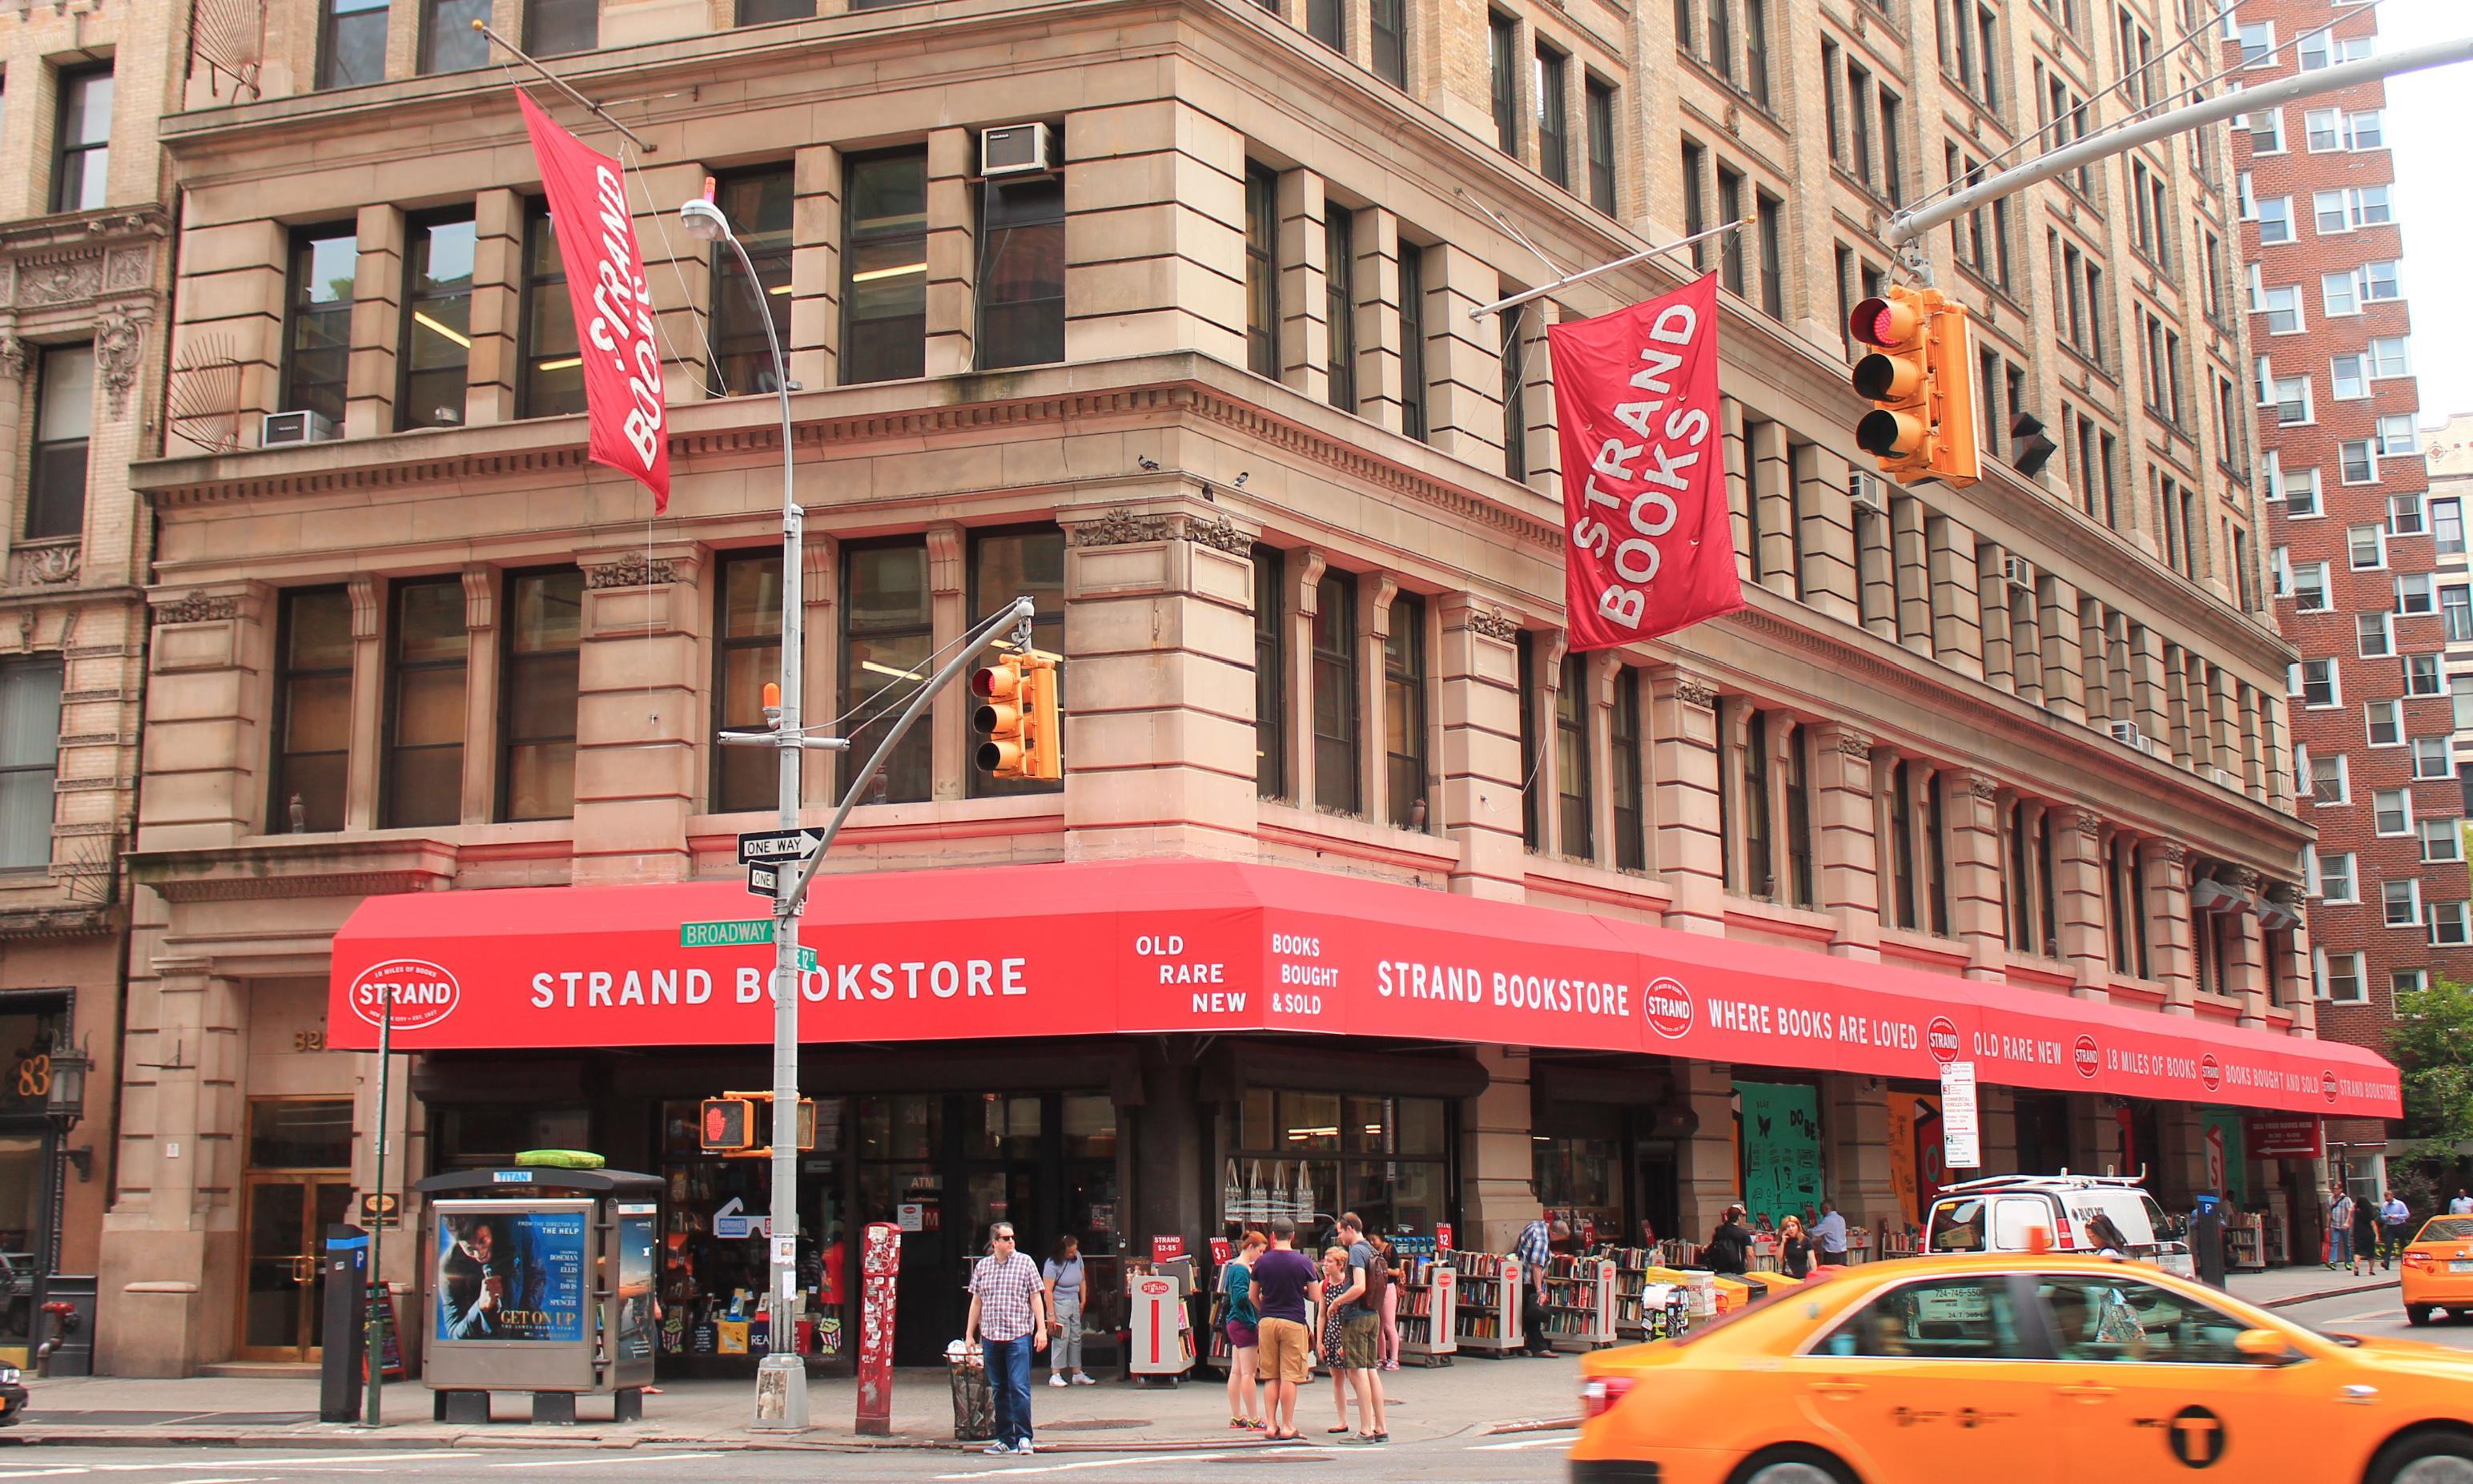 New York's Strand bookstore fights back over landmark status